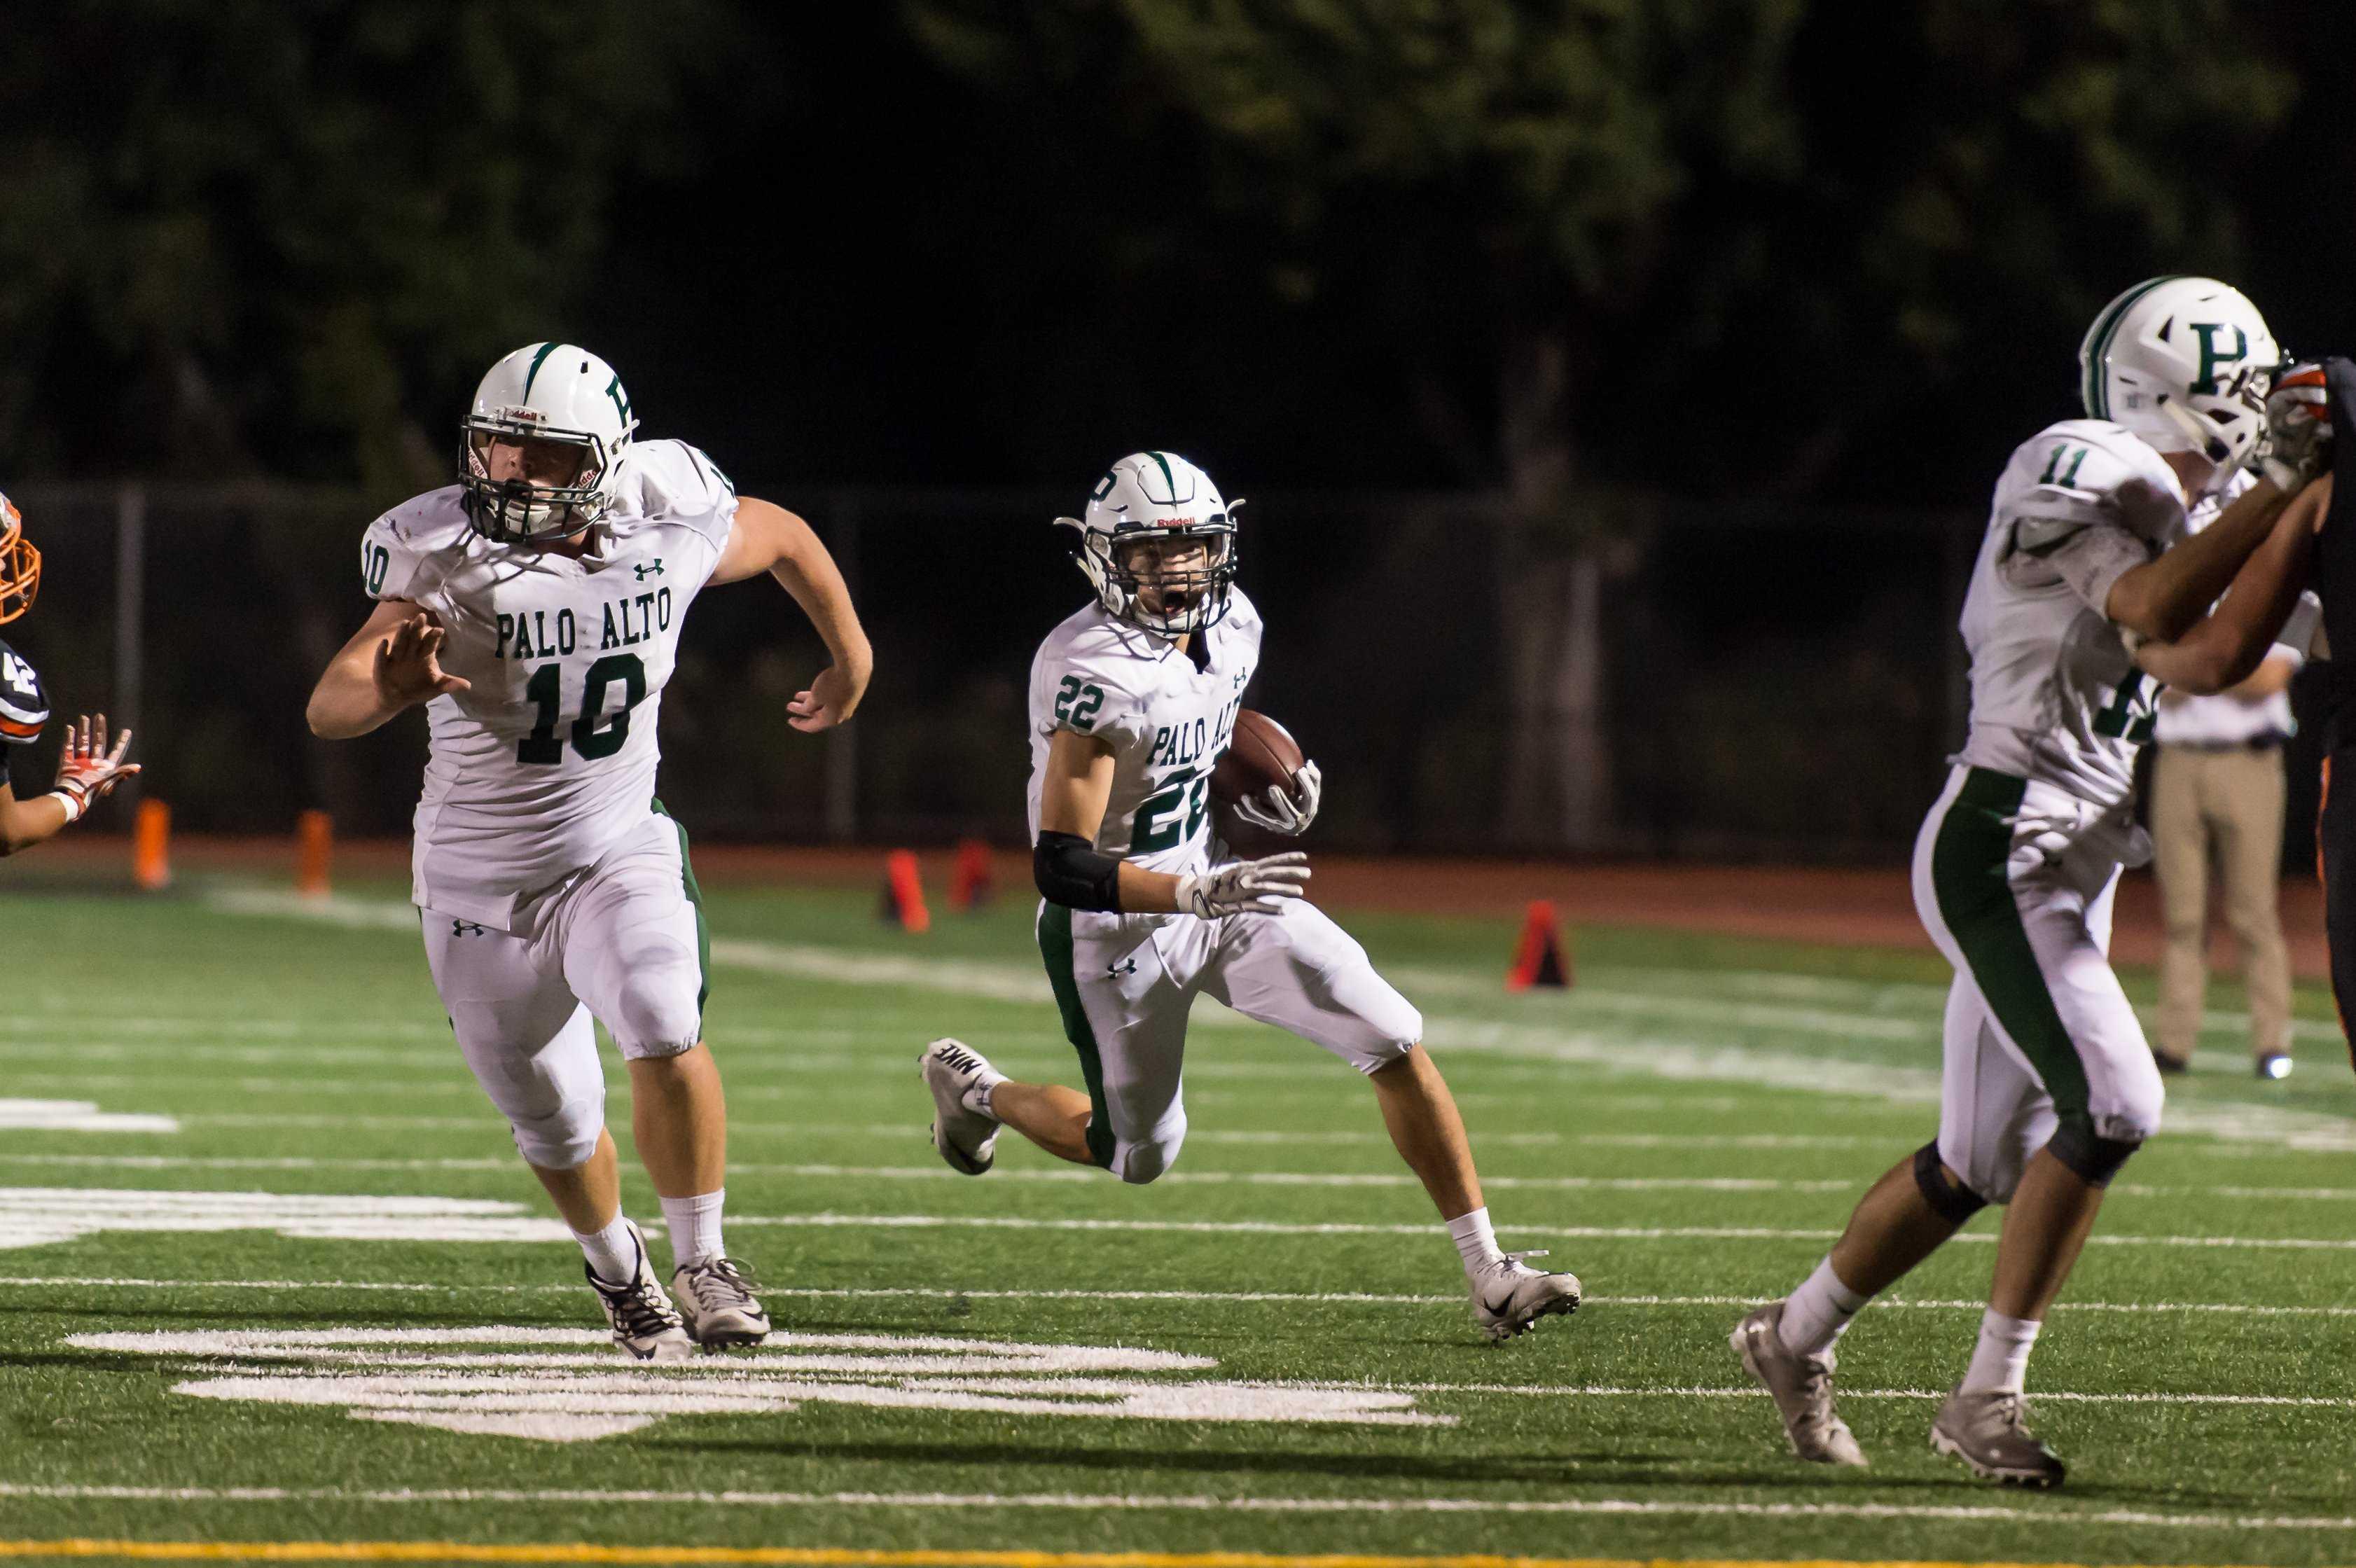 Varsity Football Falls To Powerhouse Rival Los Gatos The Campanile